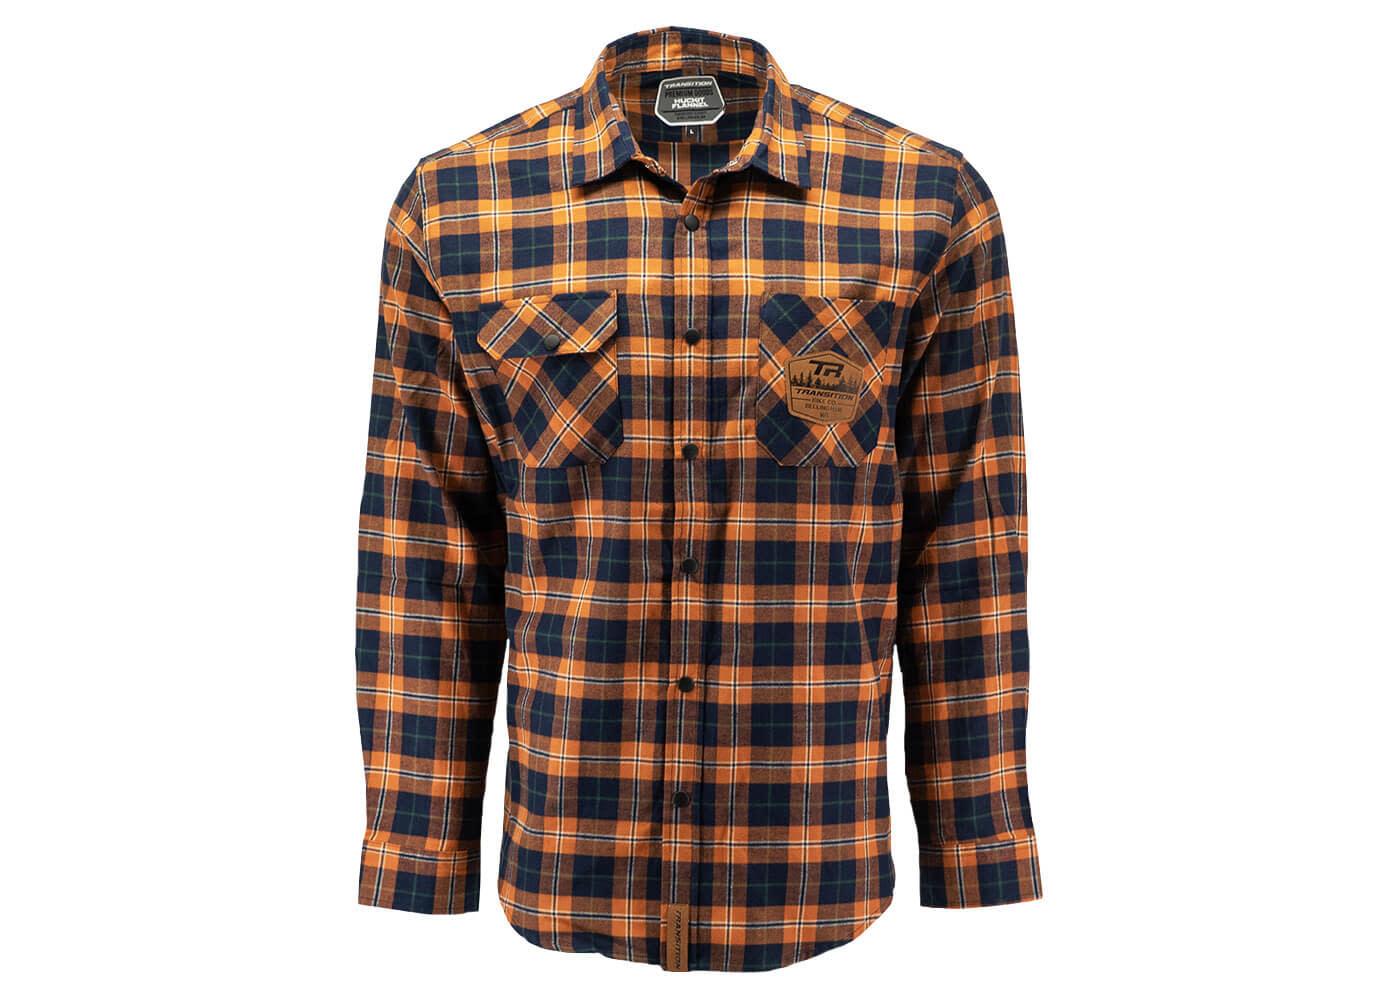 Transition TBC - Huckit Flannel (Autumn Orange Plaid, Large)